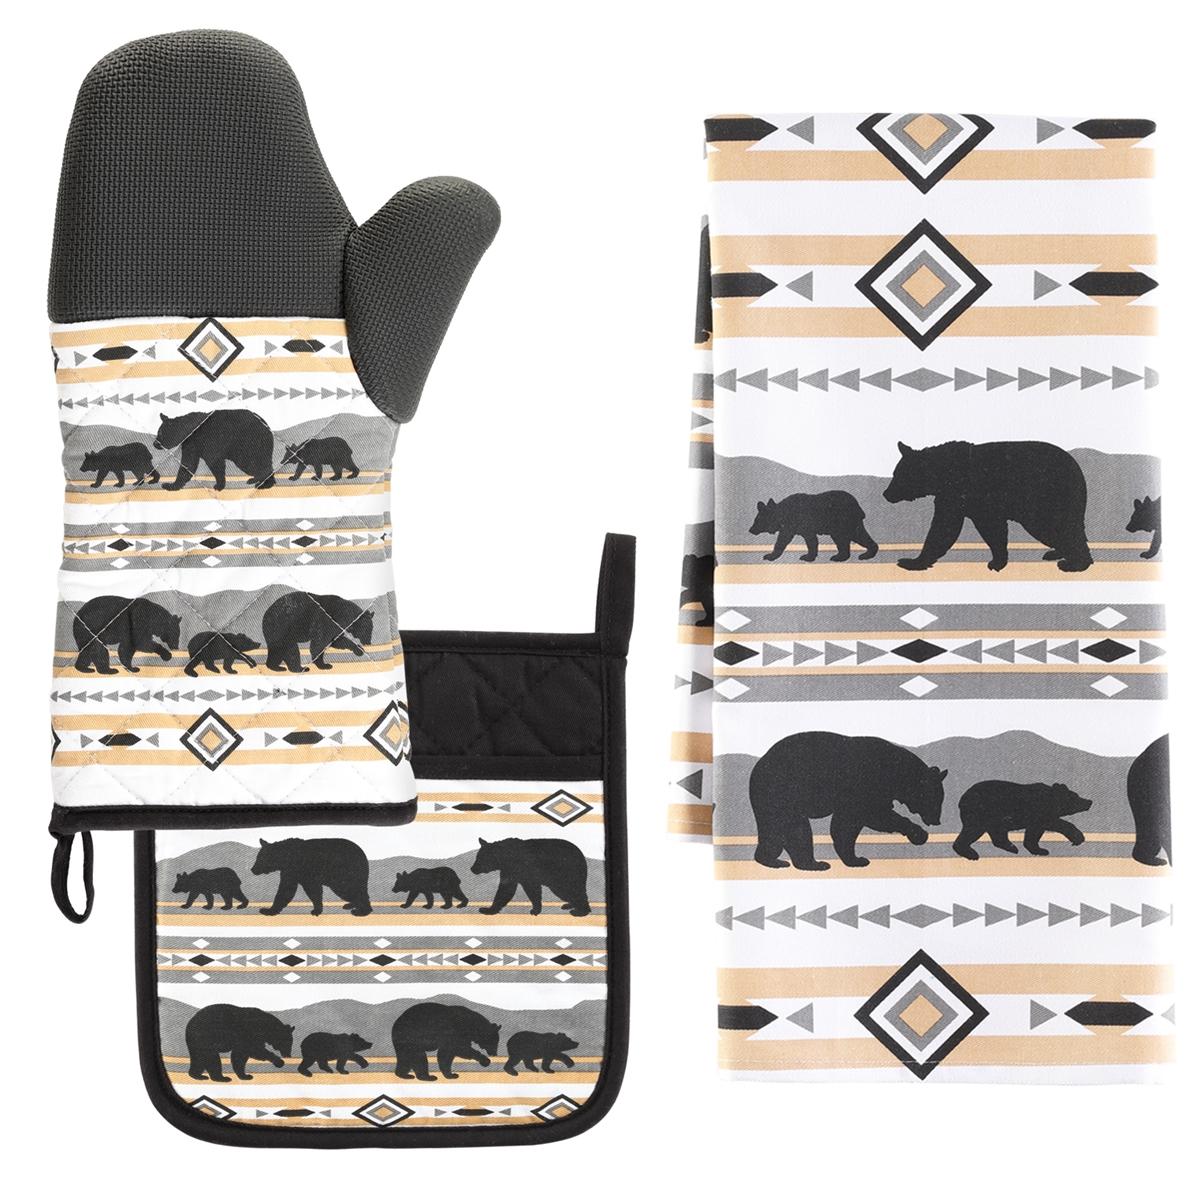 Bear Fever Kitchen Set